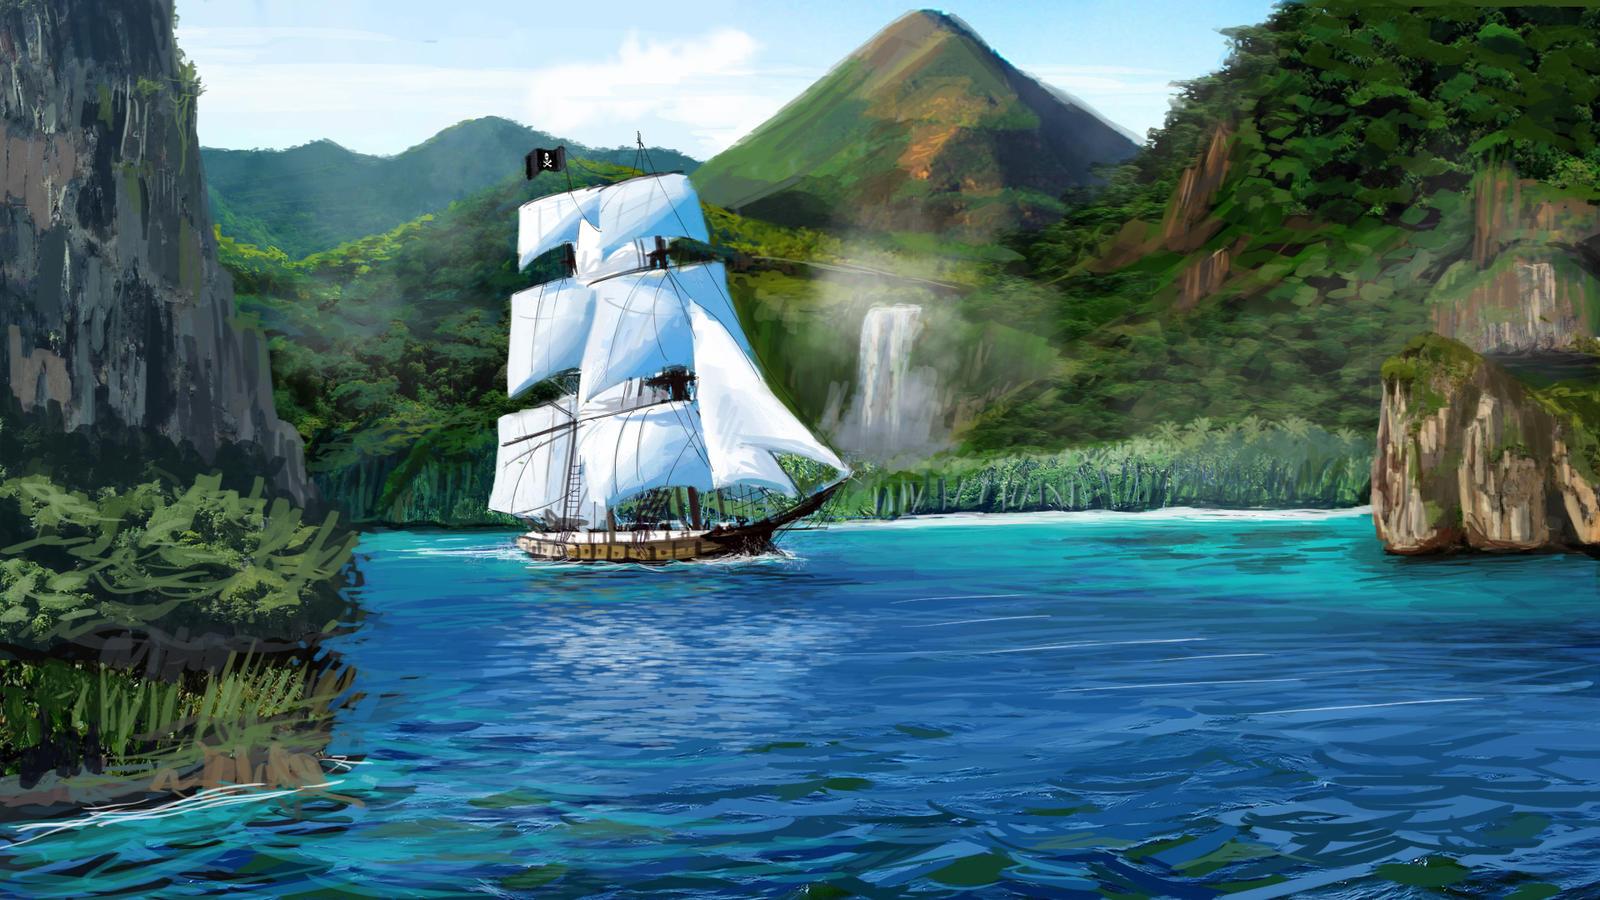 Caribbean Pirate Ship By SeniorJ